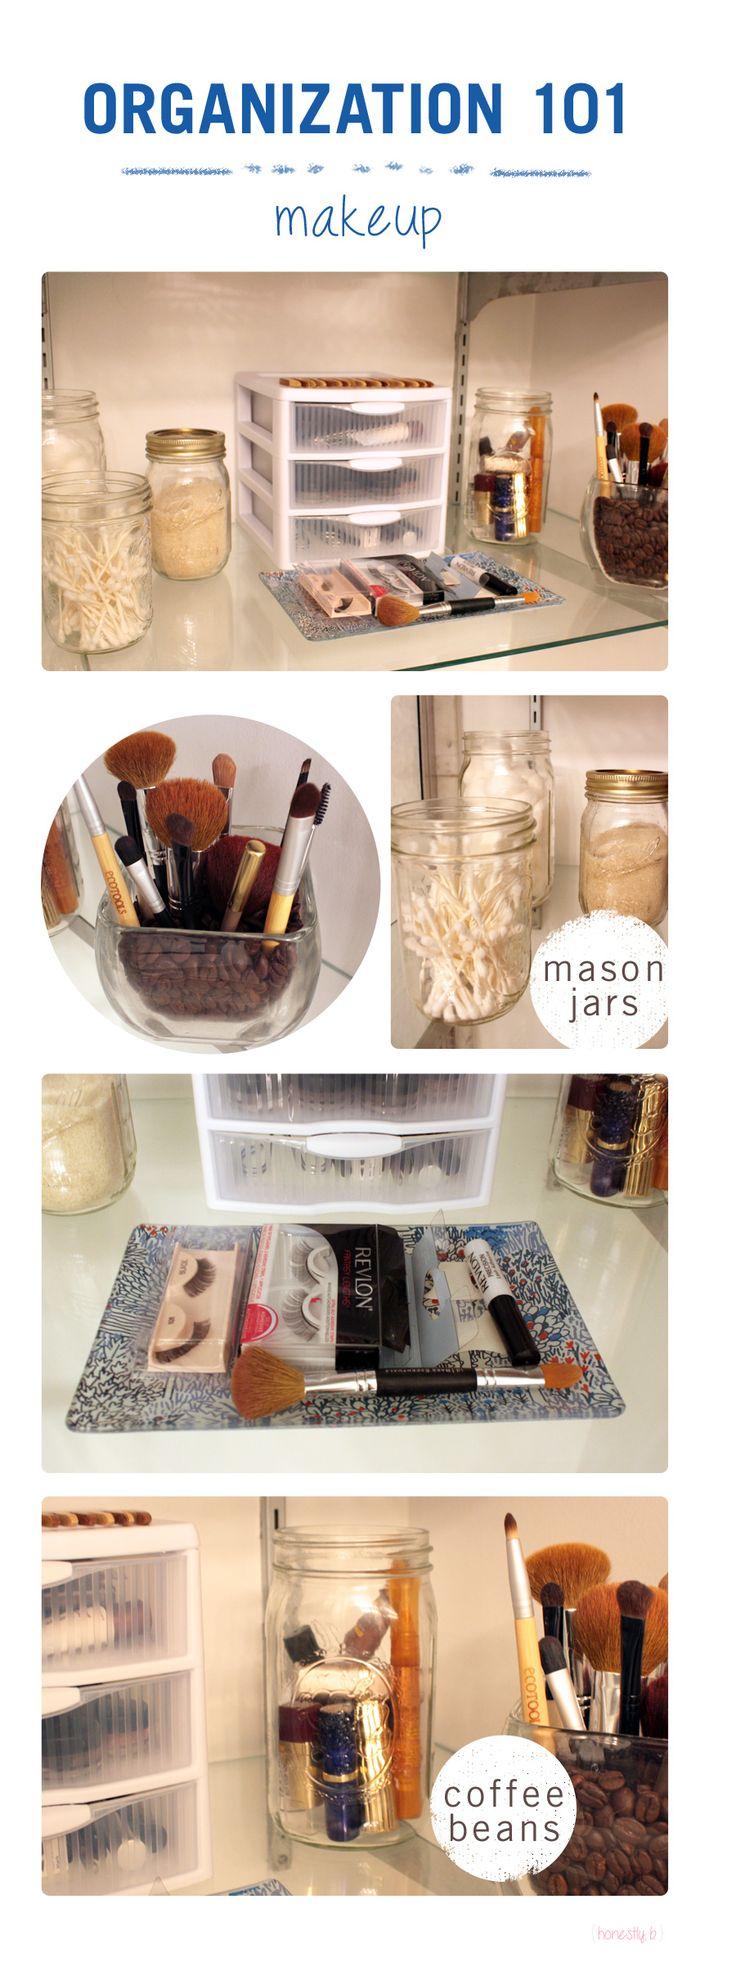 Make up Organization ideas